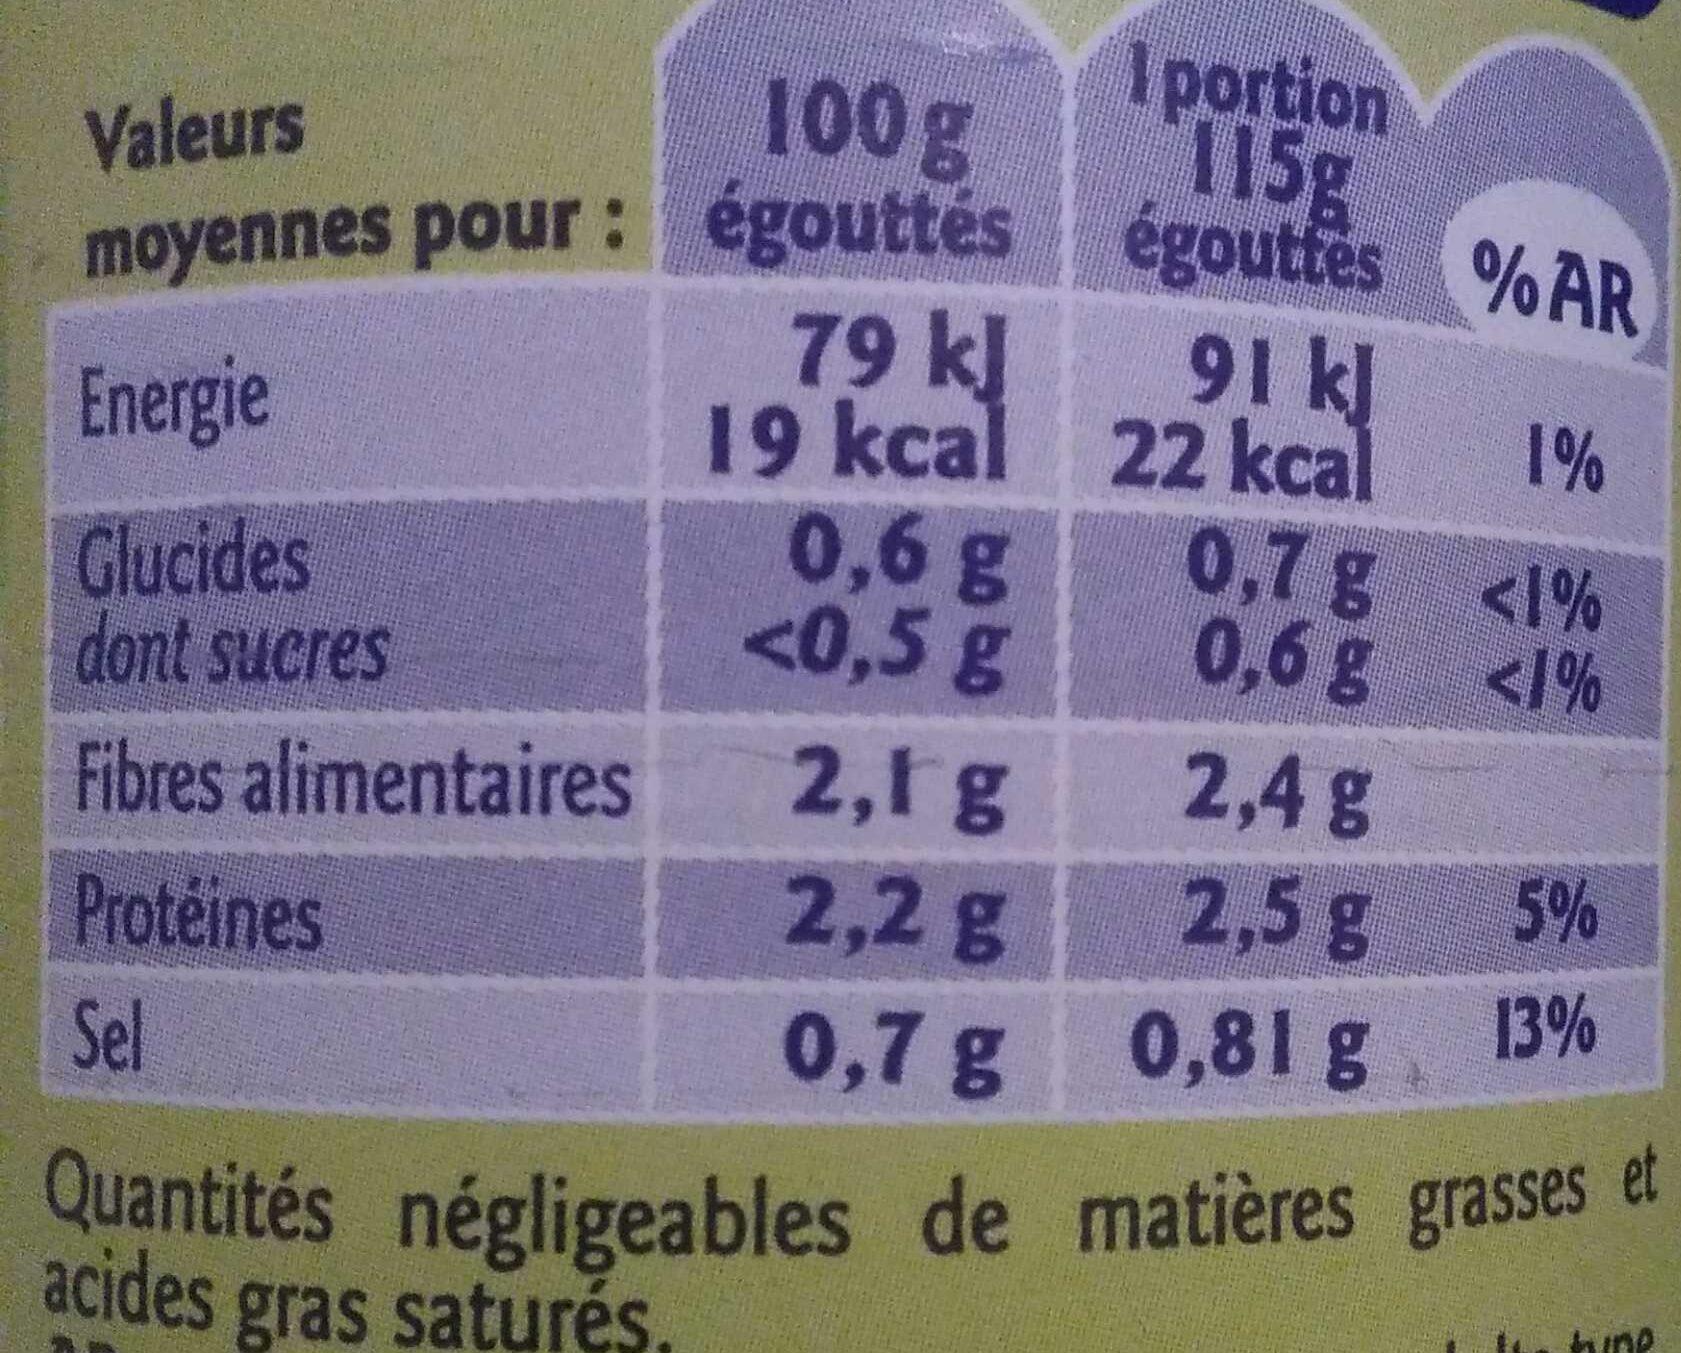 Bte 1 / 2 Champignons 1er Choix Grand Jury - Informations nutritionnelles